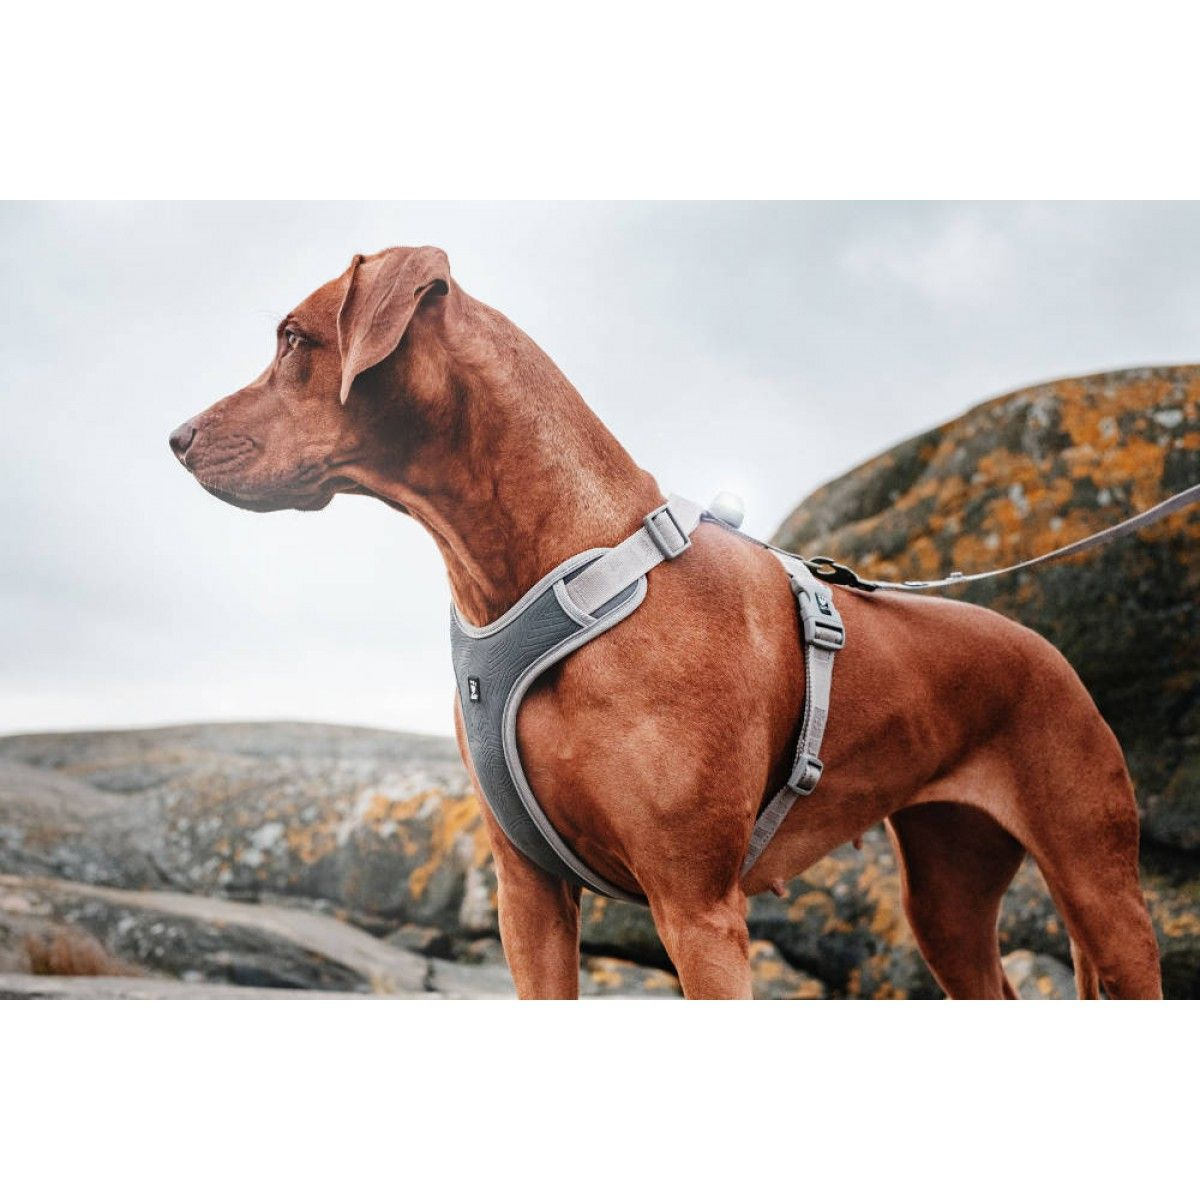 Hurtta Adventure Harness Shadow Hunde-Geschirr Grau | Trendy ...